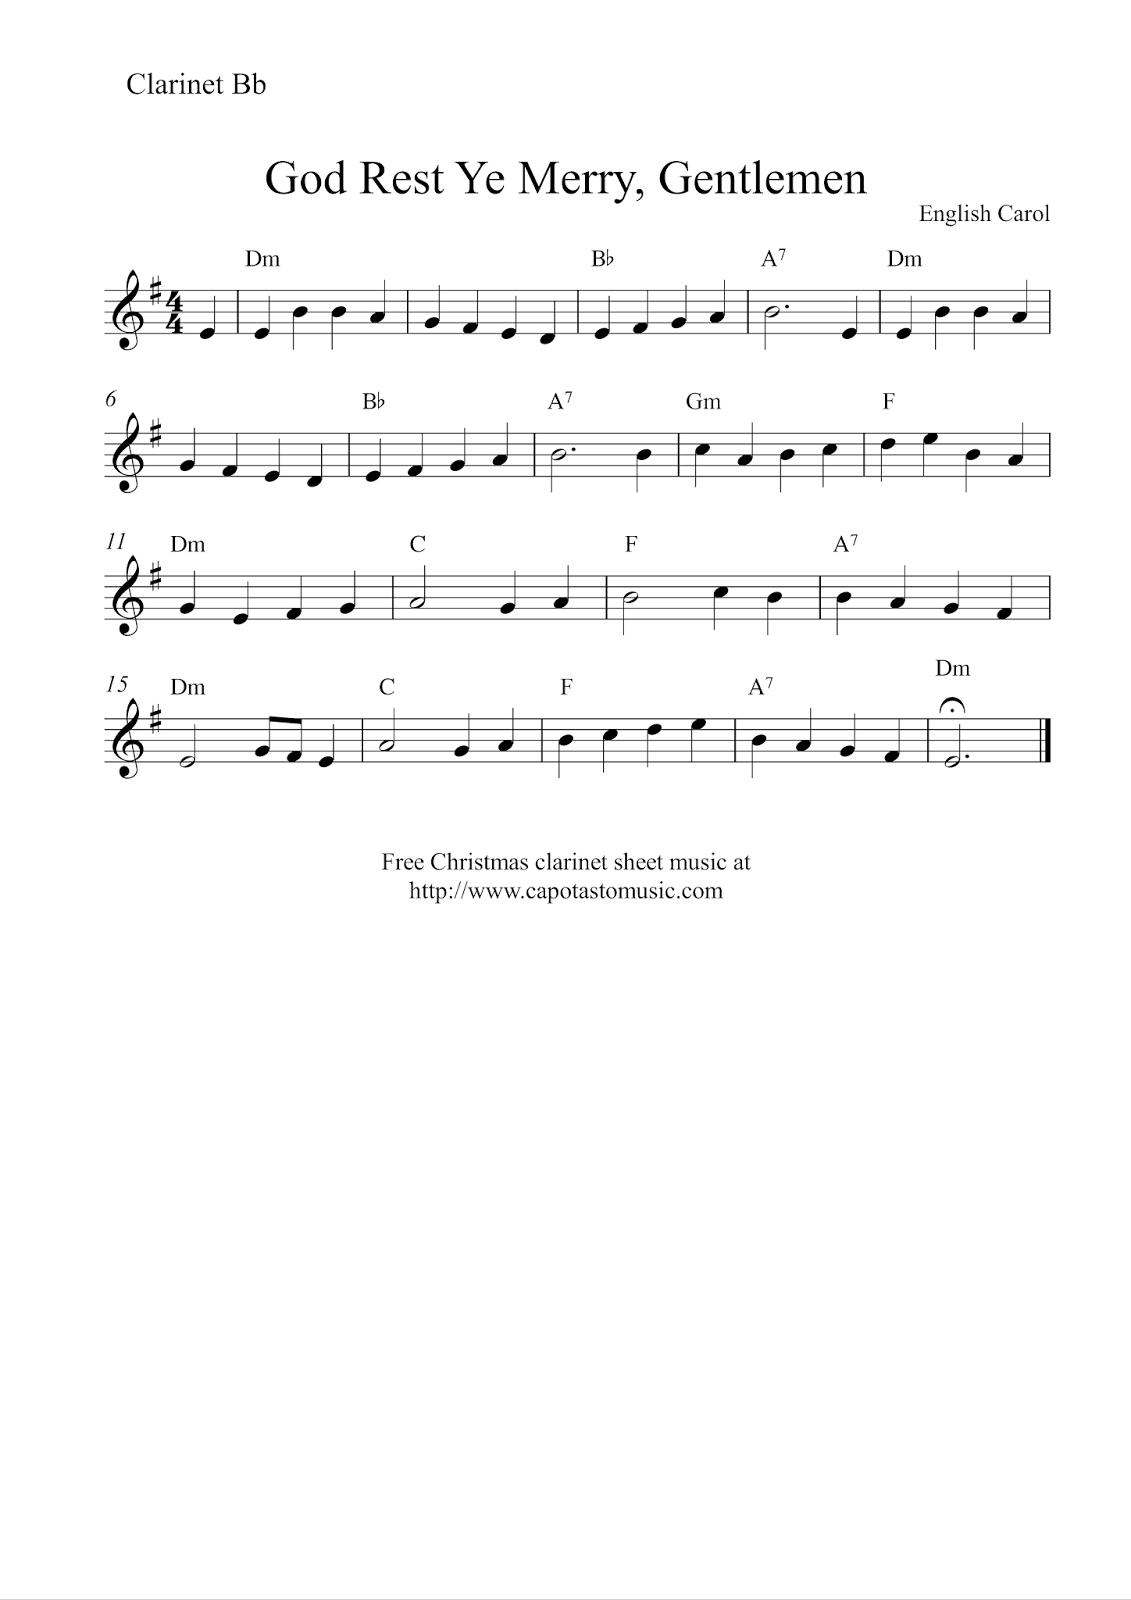 Free Christmas Clarinet Sheet Music - God Rest Ye Merry, Gentlemen - Free Printable Christmas Sheet Music For Clarinet